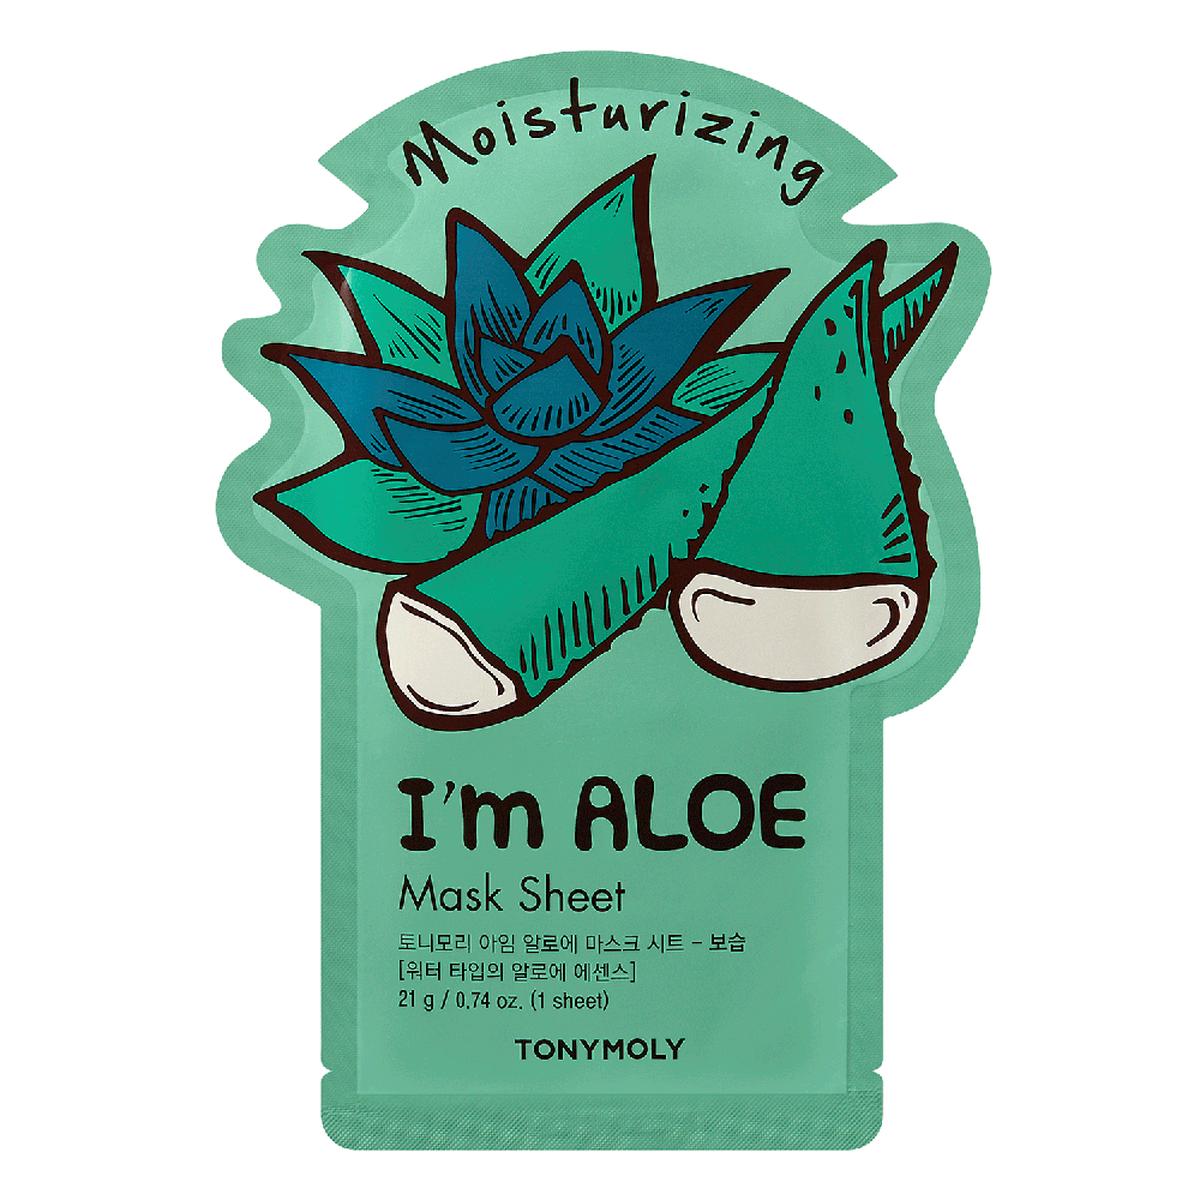 Máscara Im Real Hidratant Tony Moly